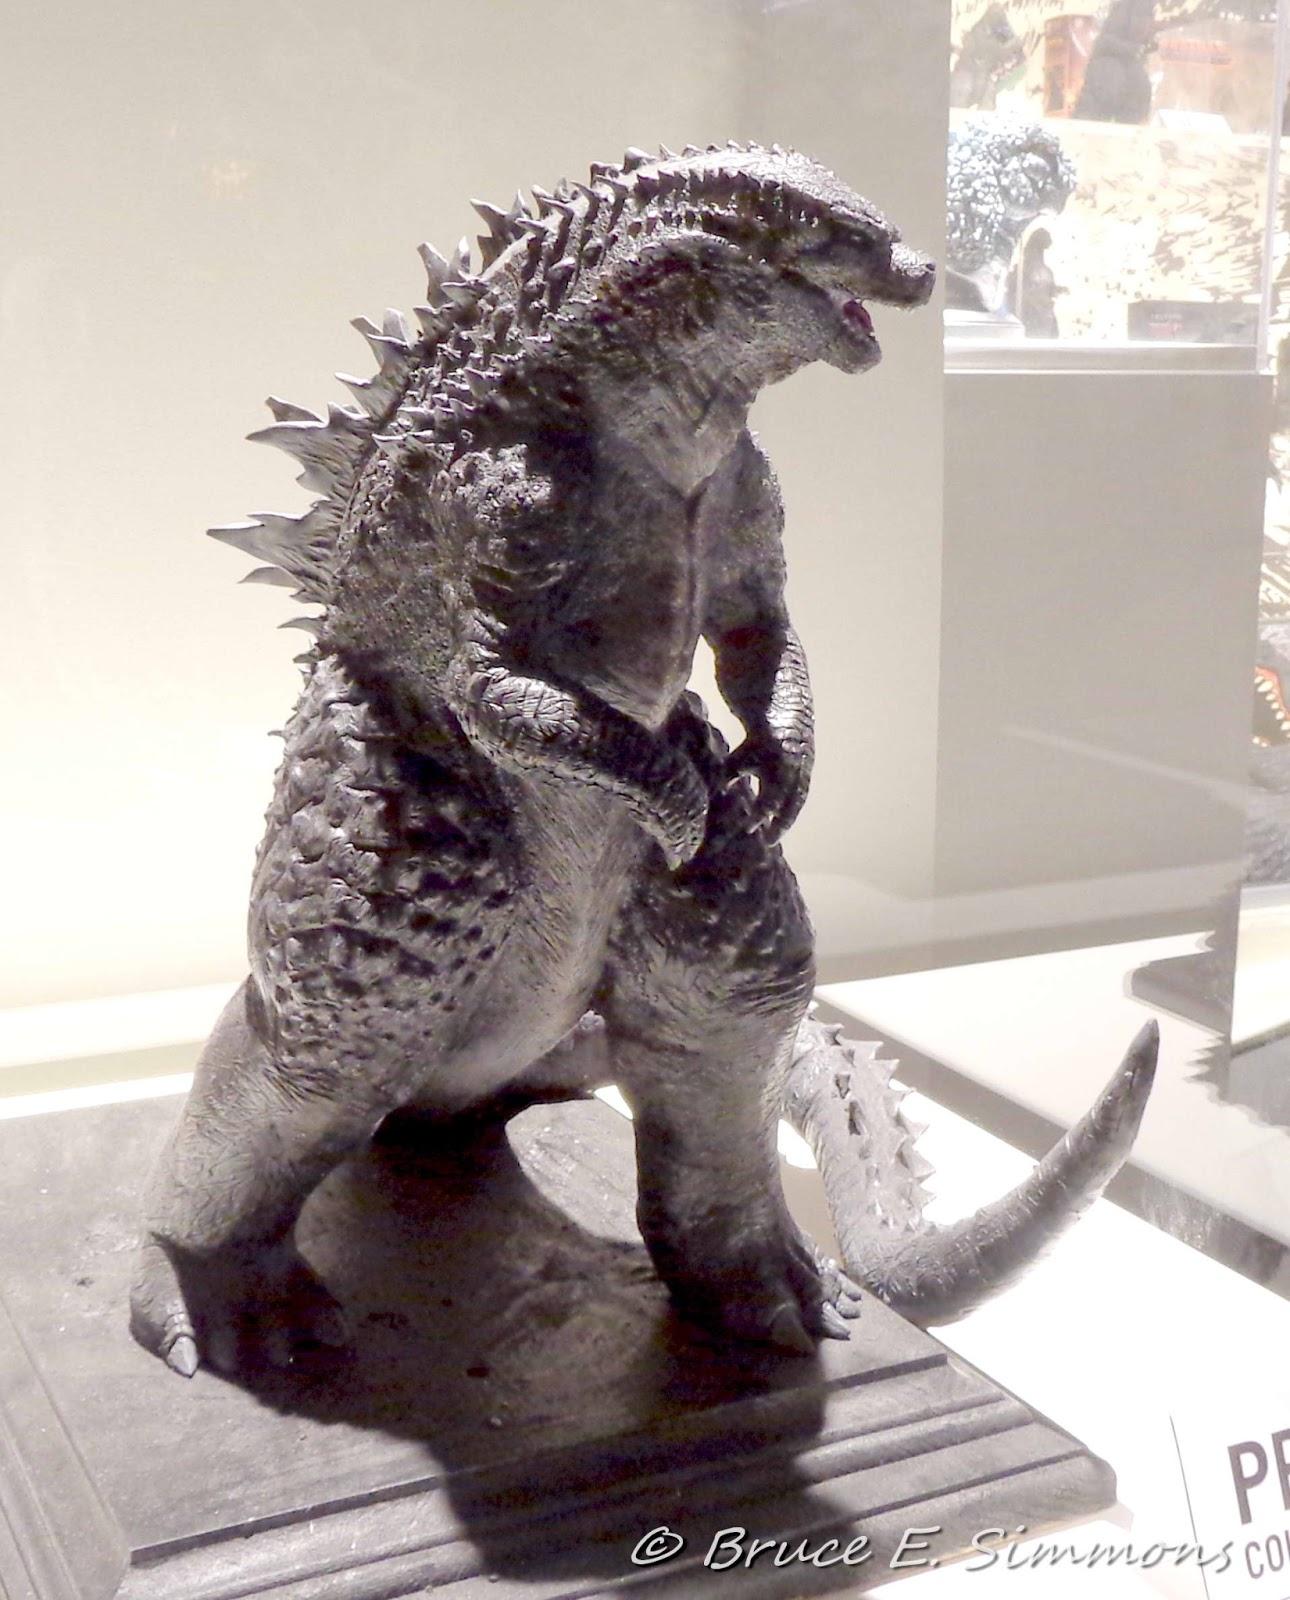 Godzilla 2014 model